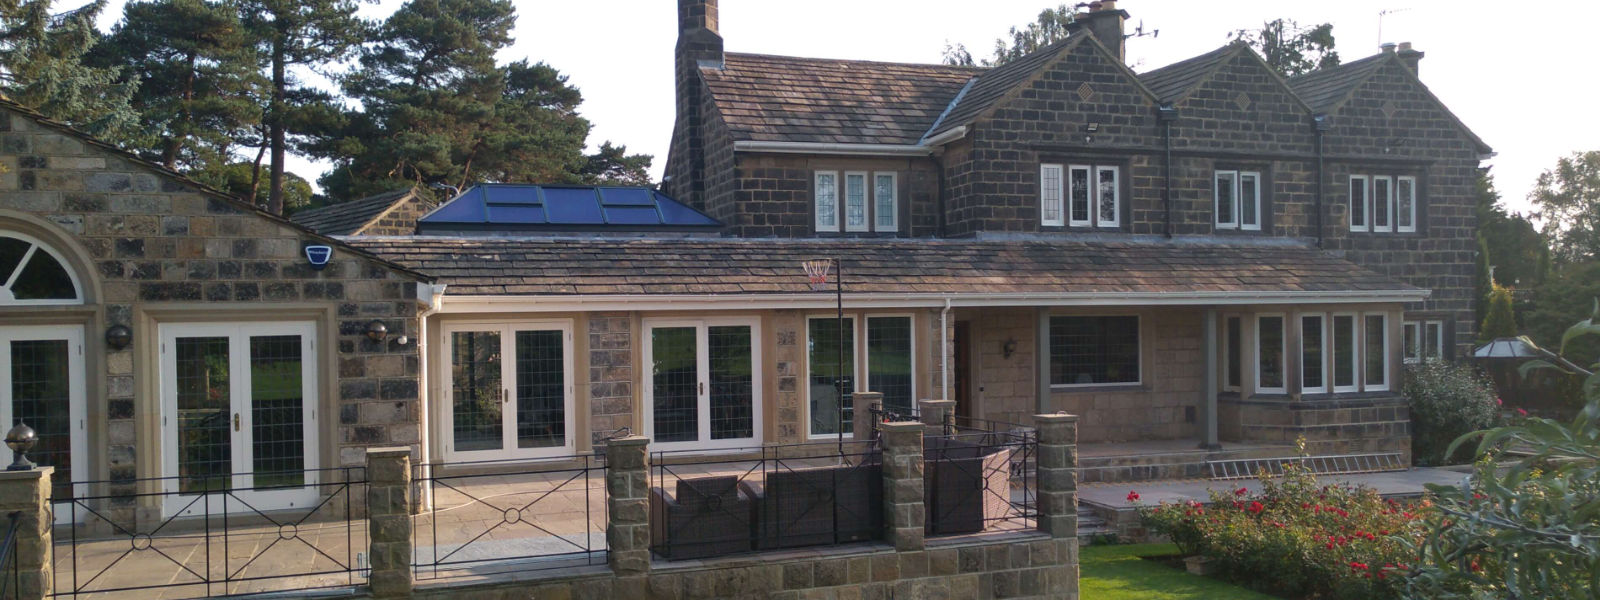 Building Extensions in Addingham